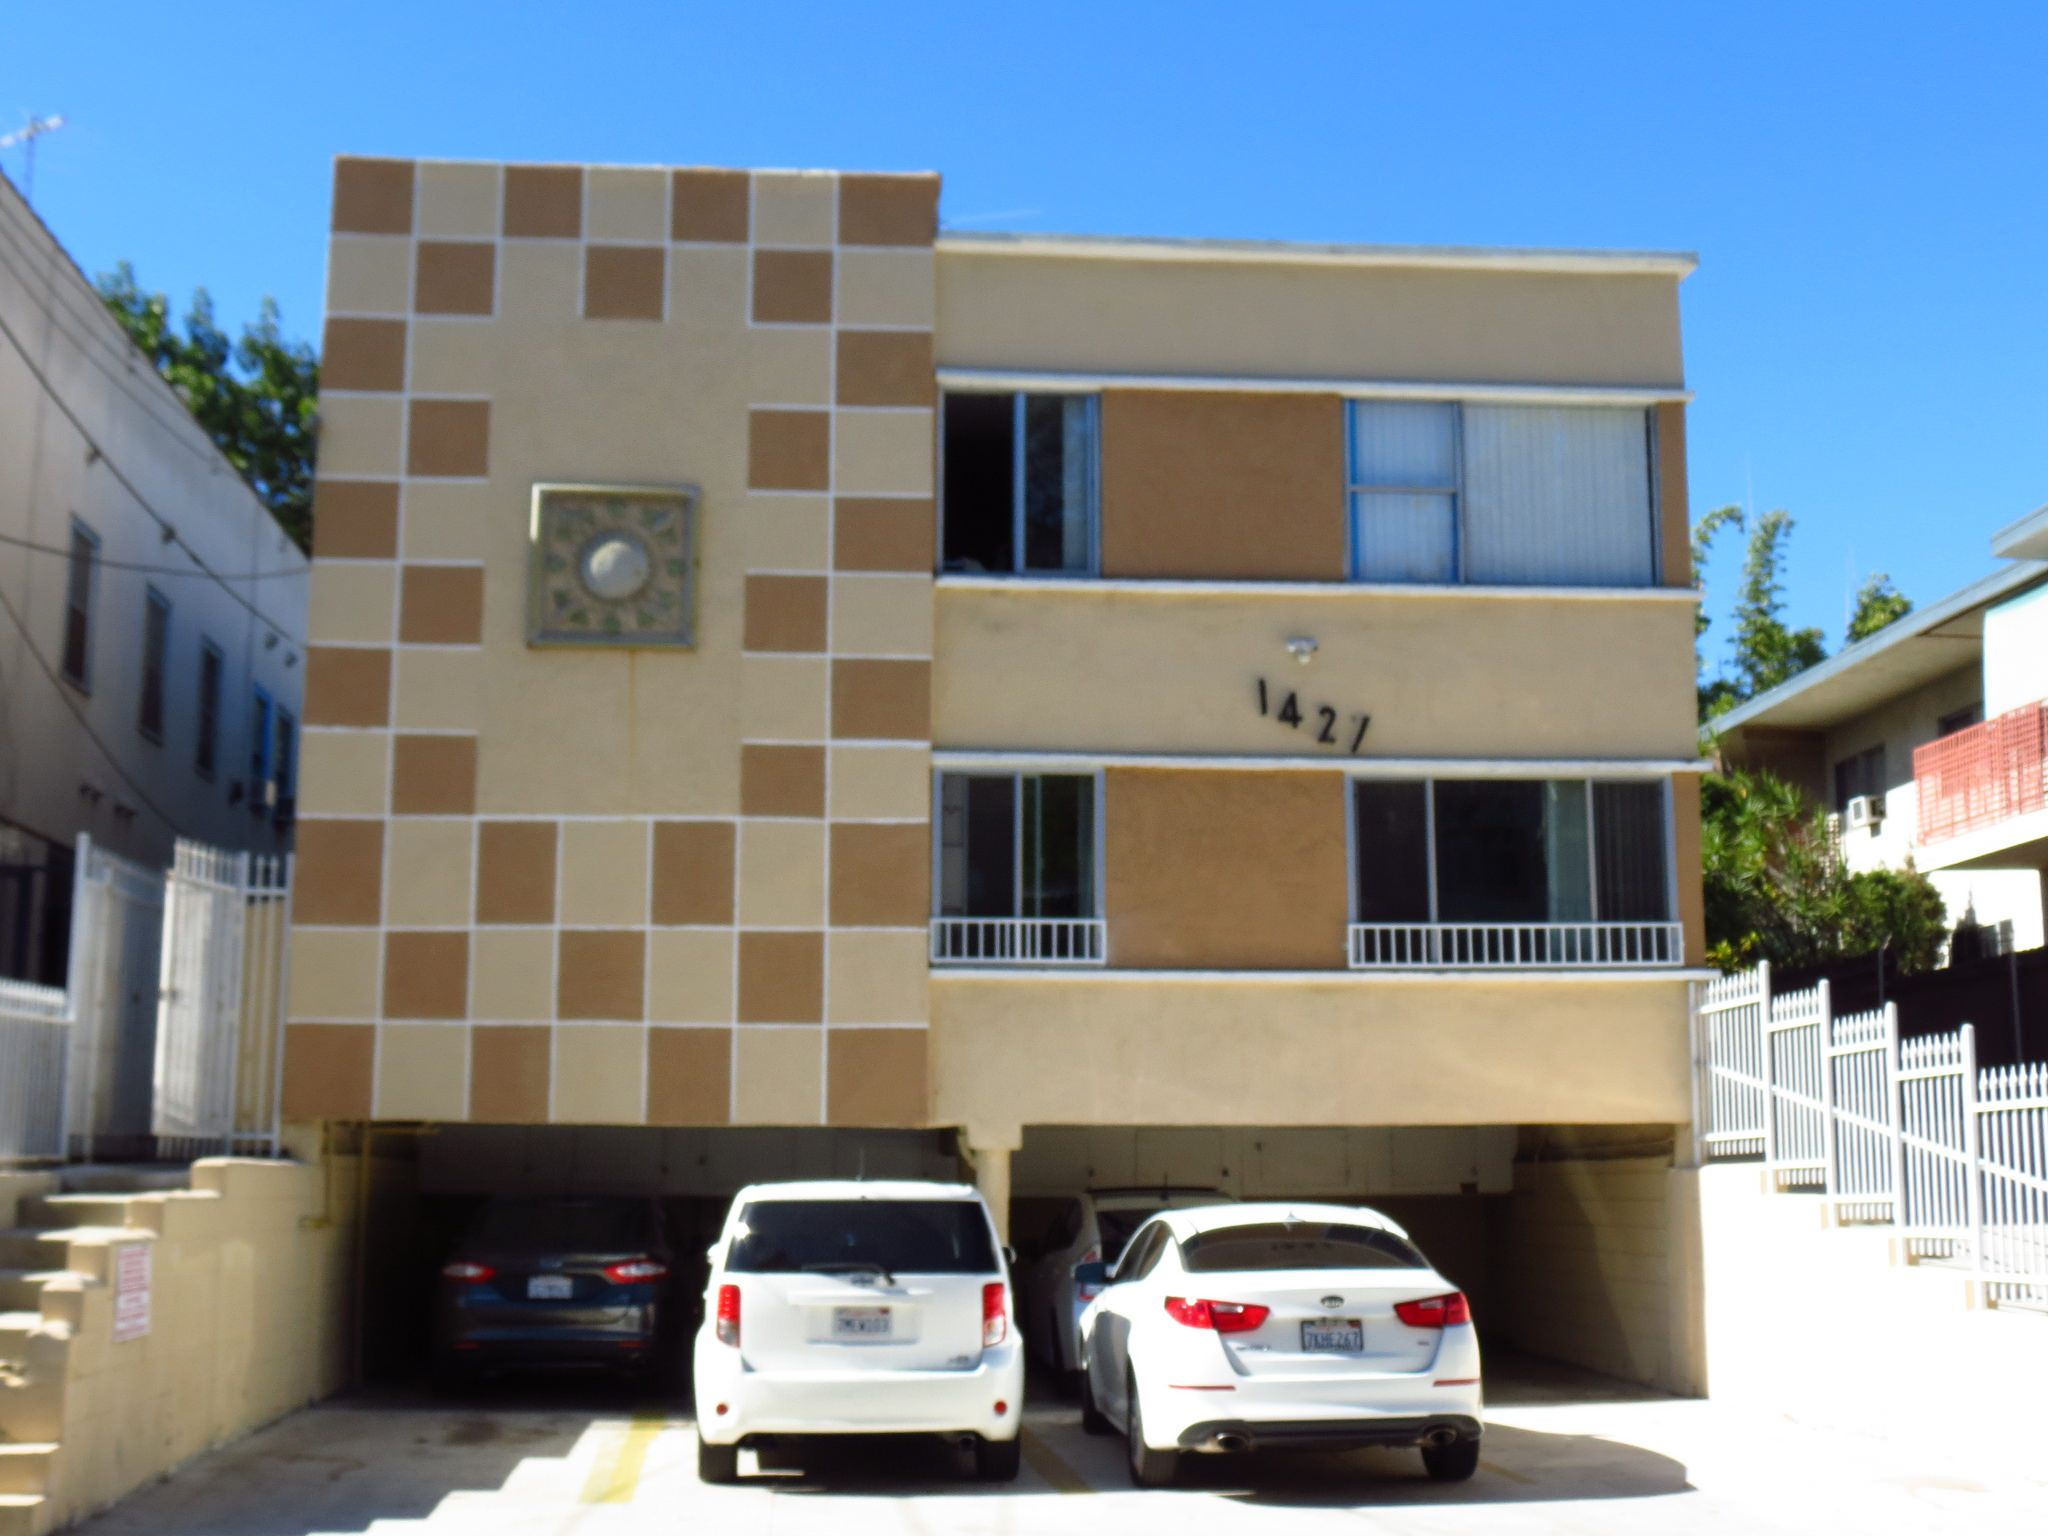 Https Flic Kr P Arhyqj Dingbat Apartment Los Angeles Ca Los Angeles Architecture American Architecture Mid Century Architecture